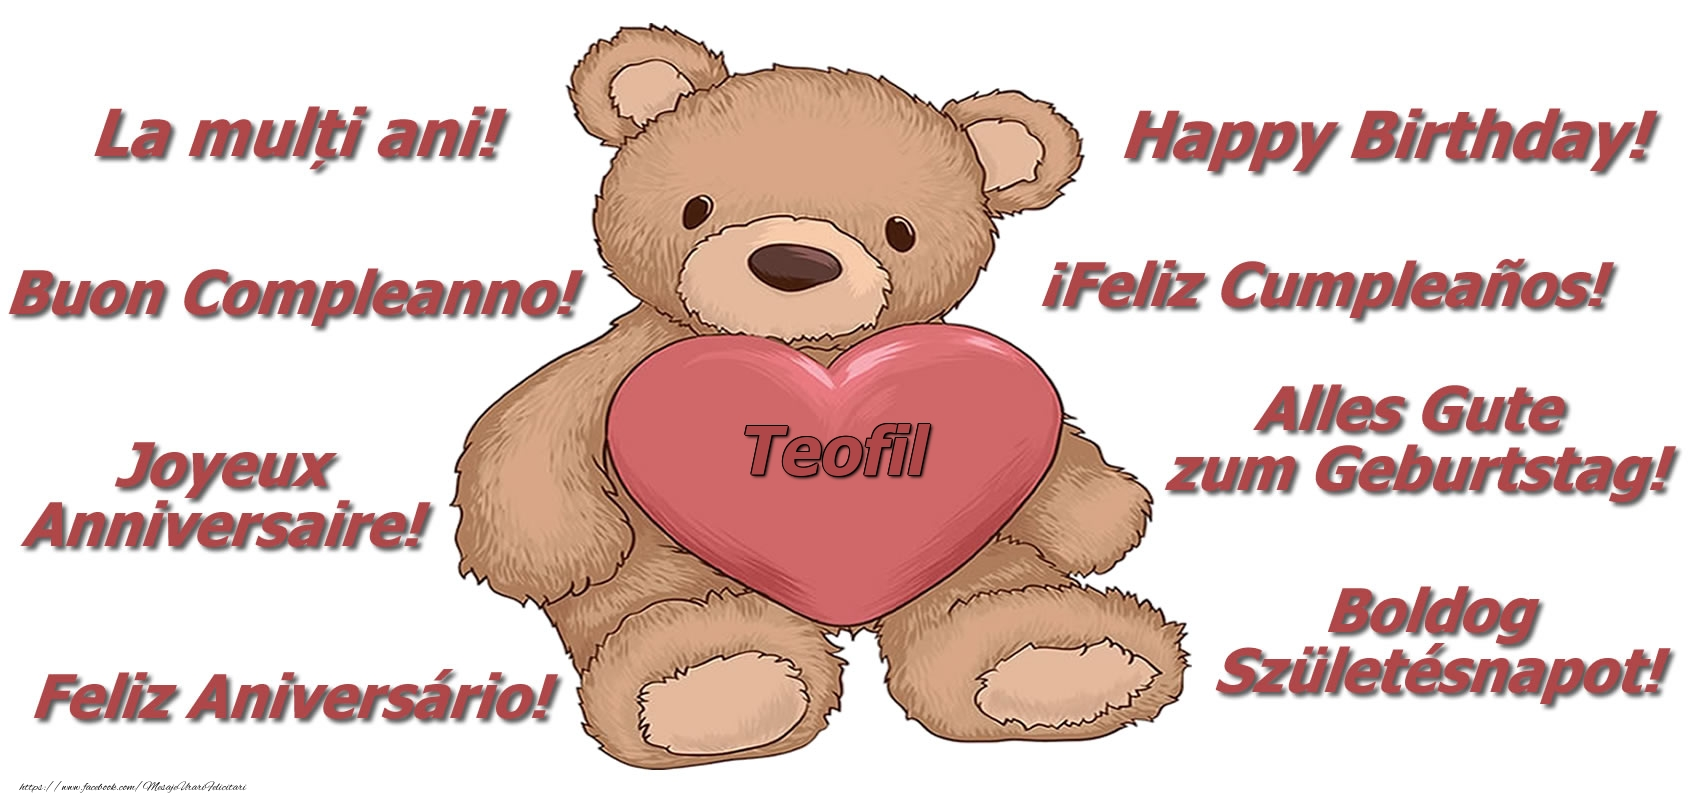 Felicitari de zi de nastere - La multi ani Teofil! - Ursulet